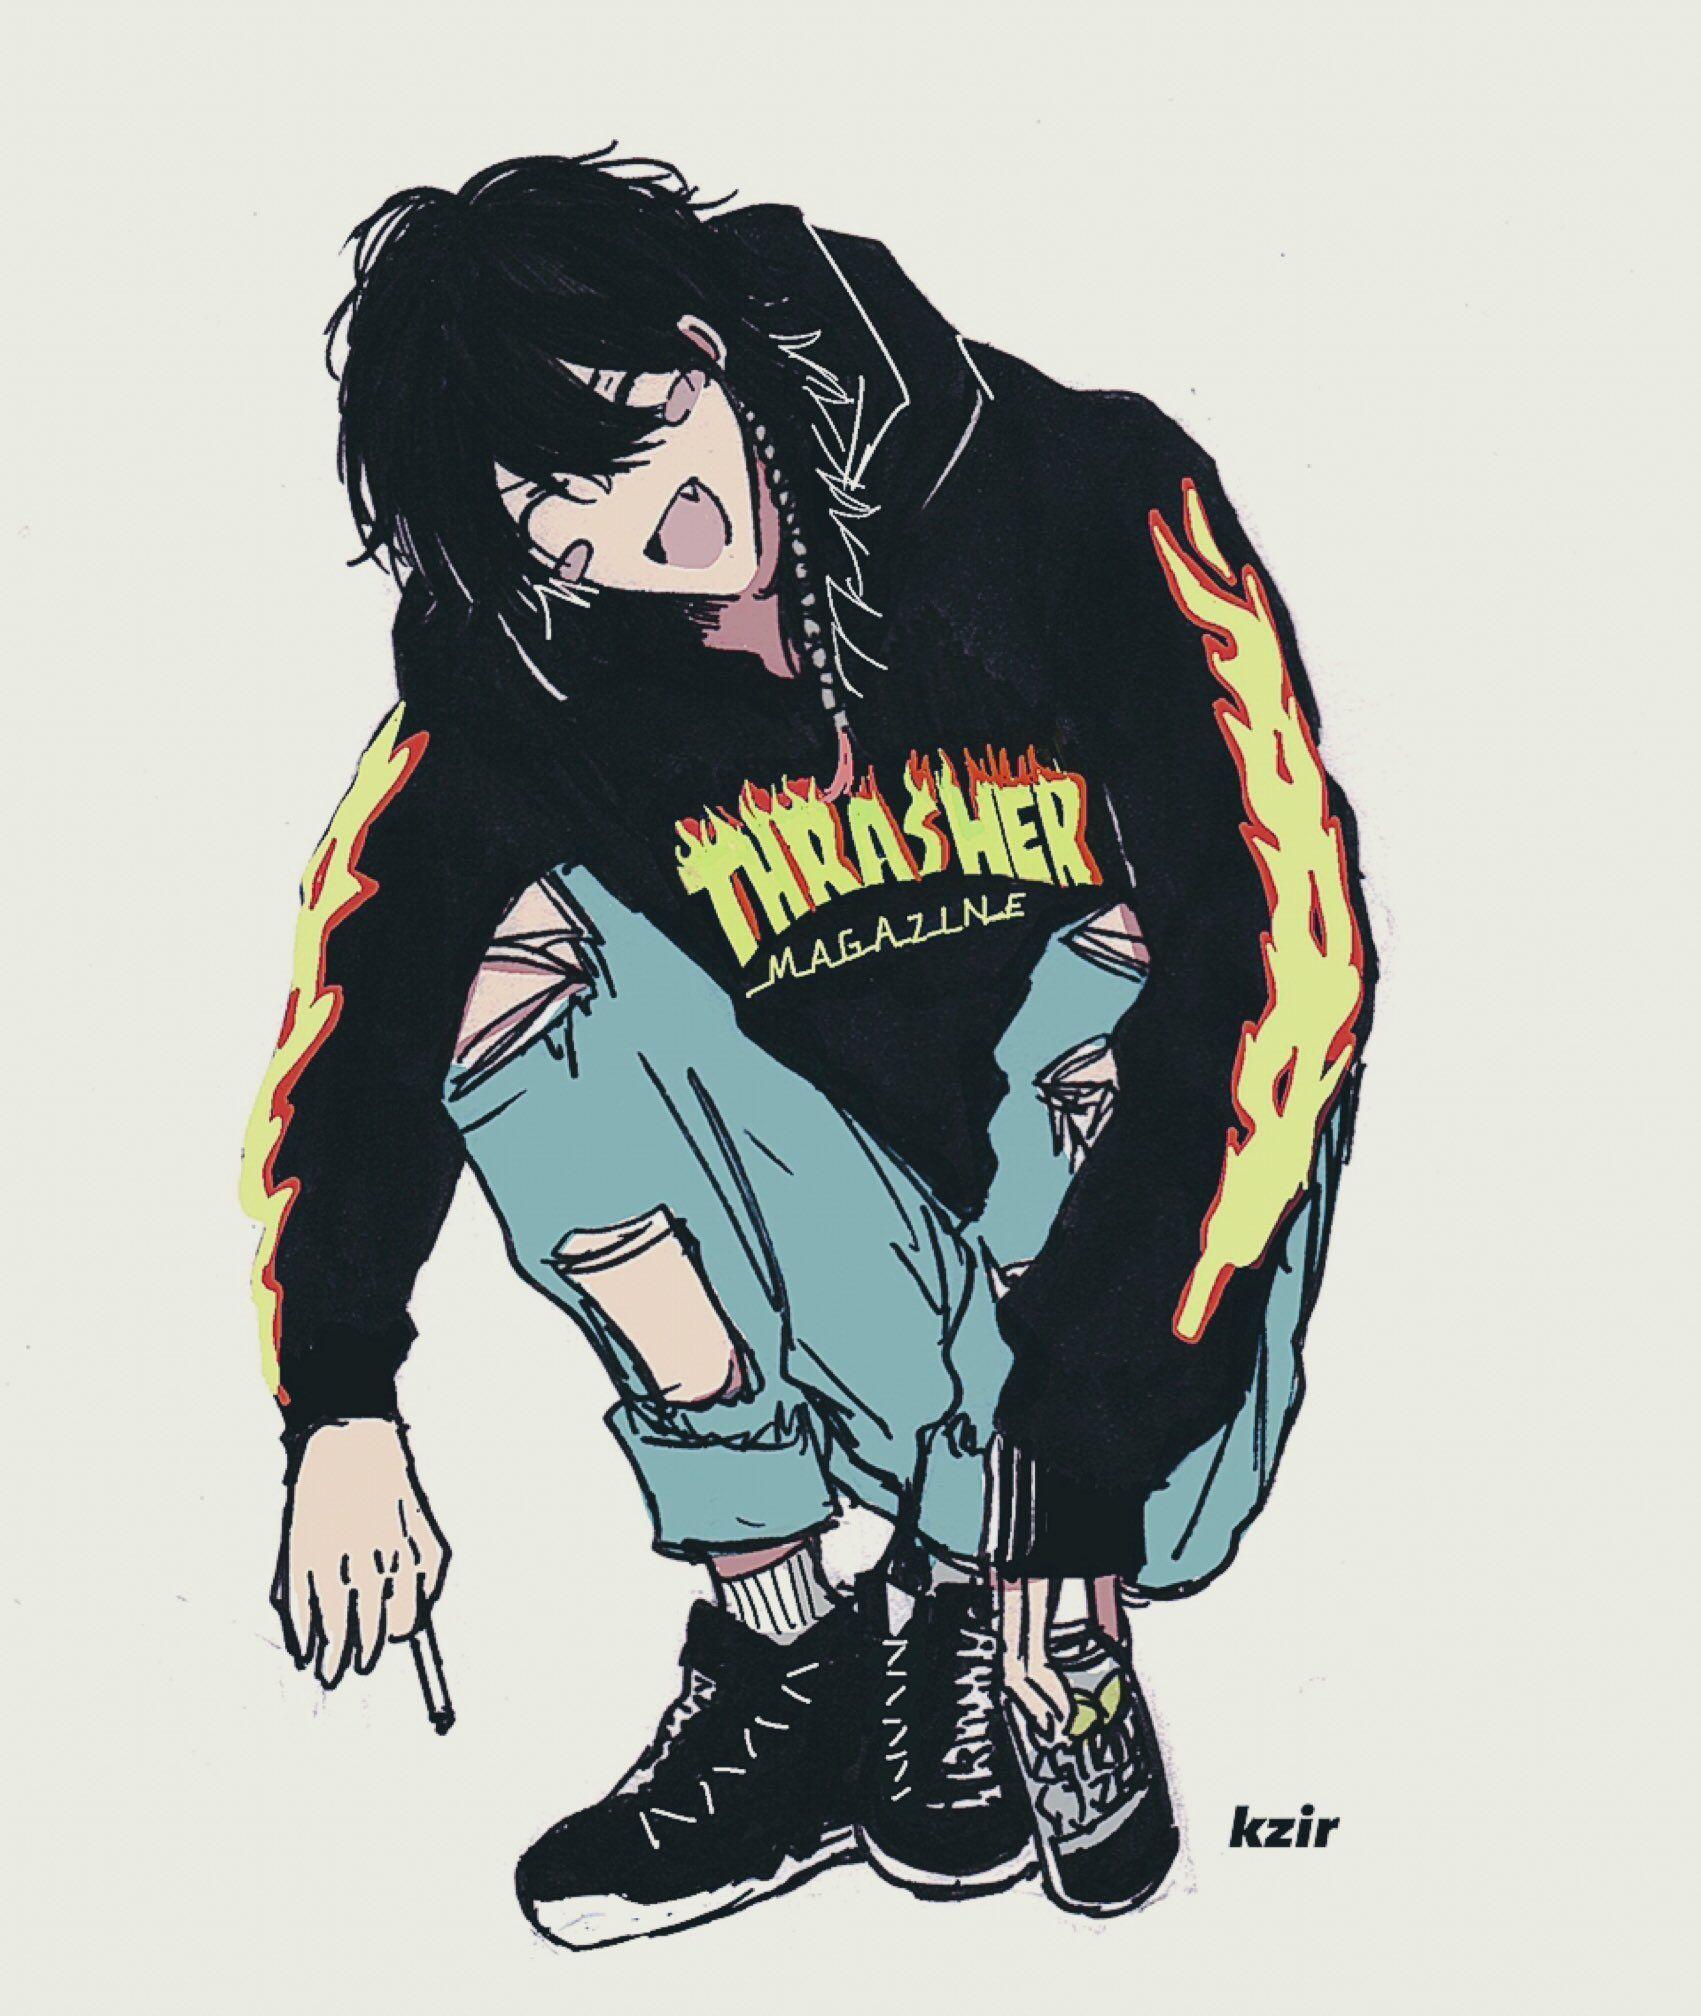 Aesthetic Skate Anime in 2020 | Tomboy art, Anime drawings ...